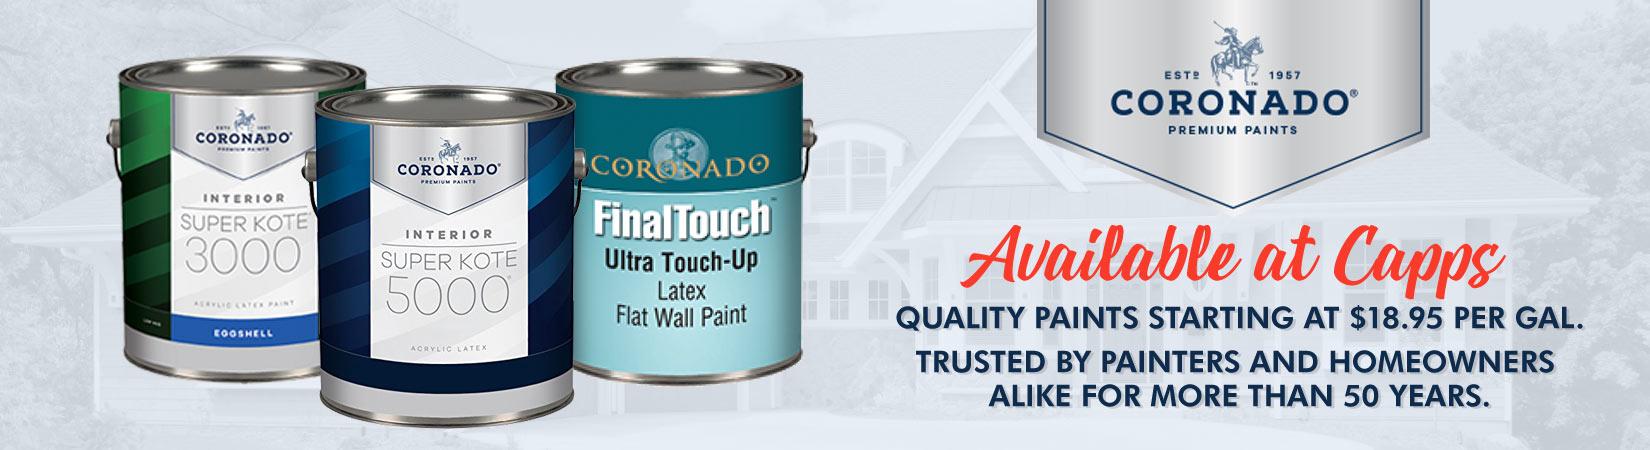 Coronado Paints ad